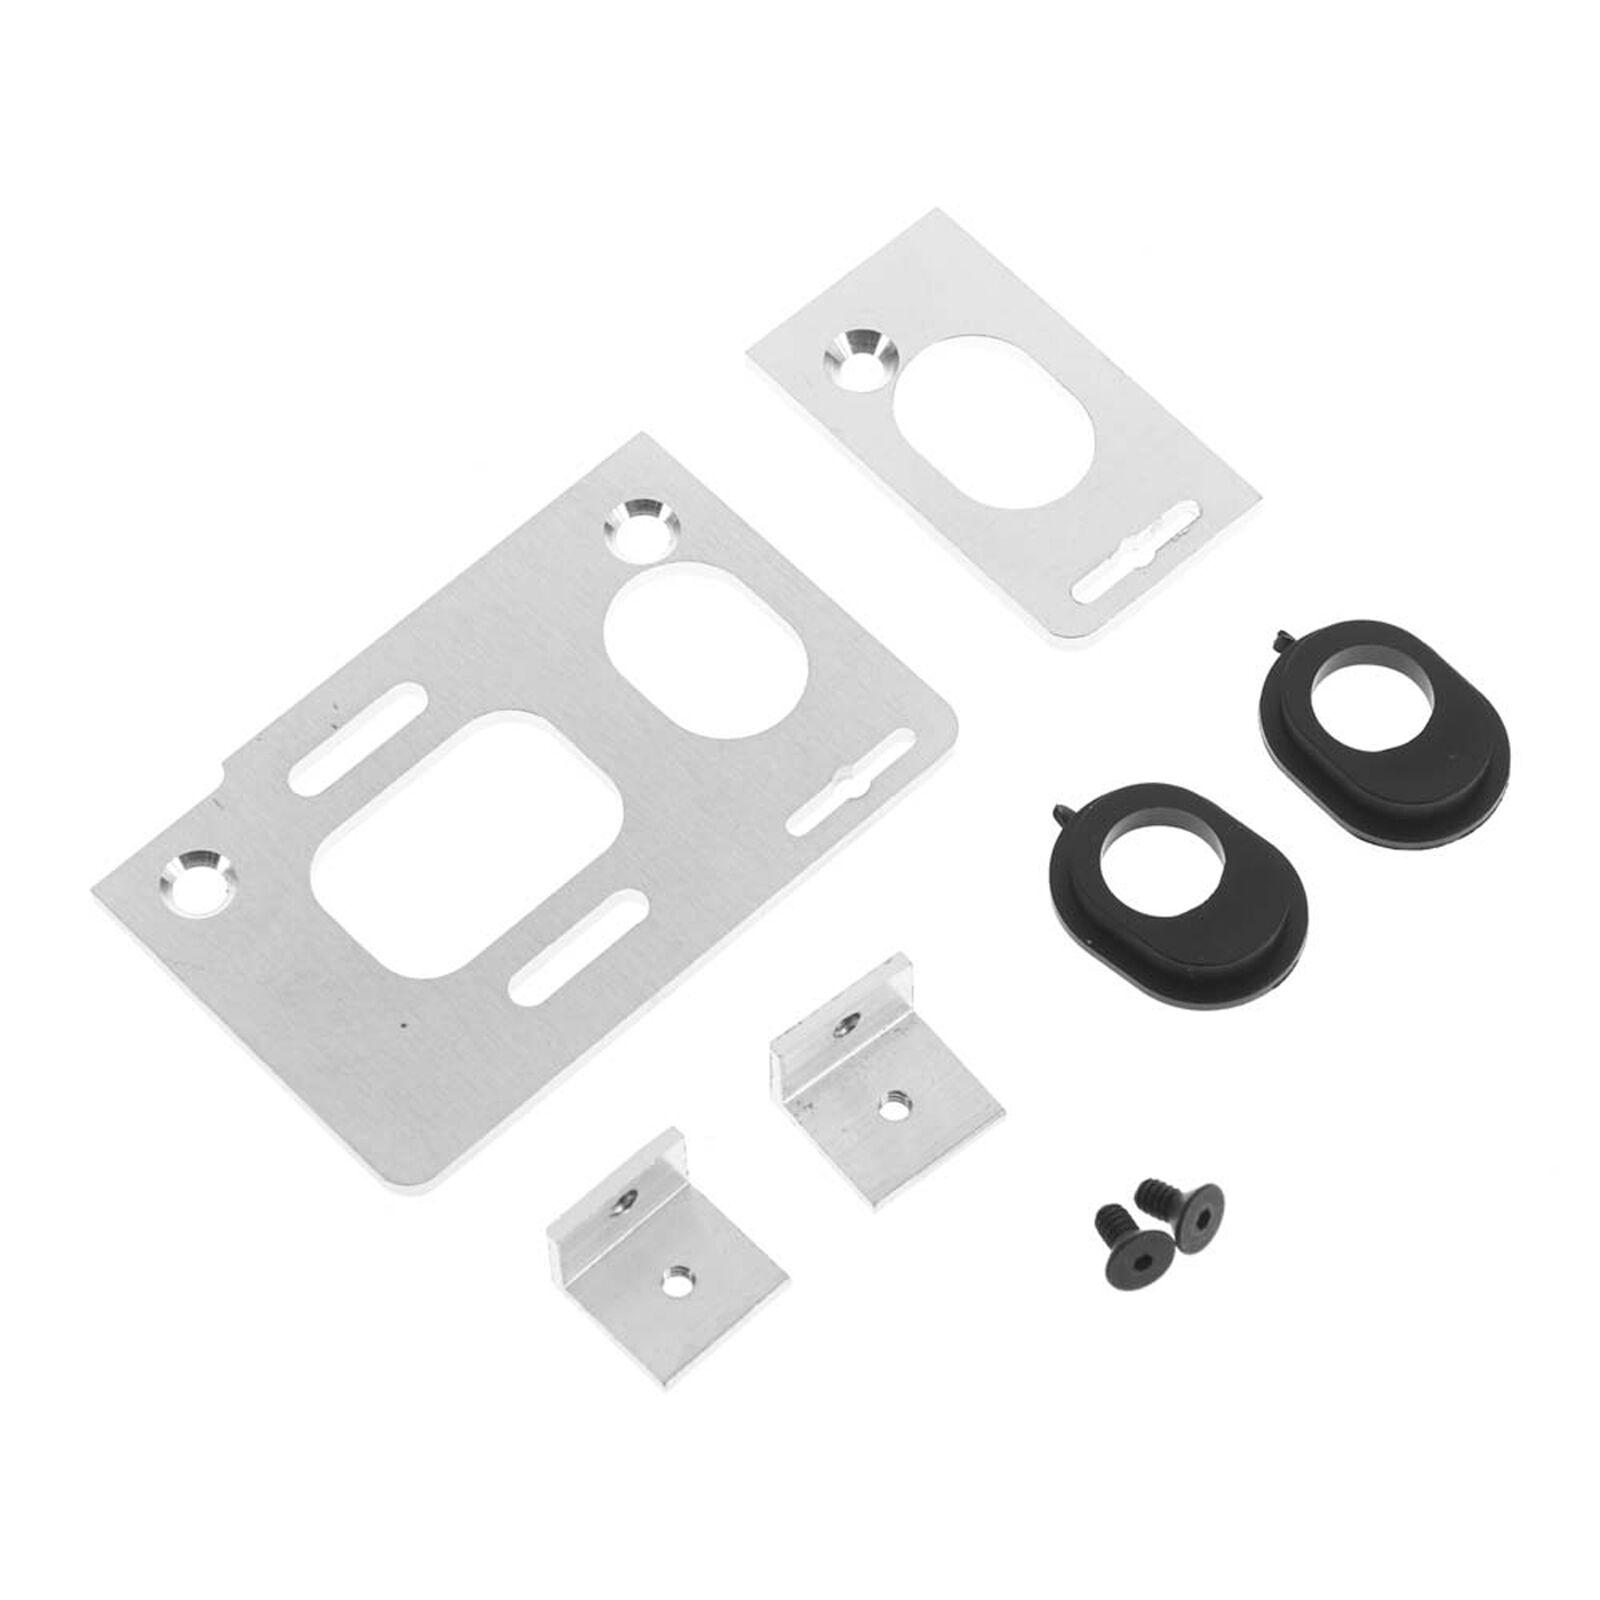 Aluminum Motor Axle Mount: Electric Drag Kits